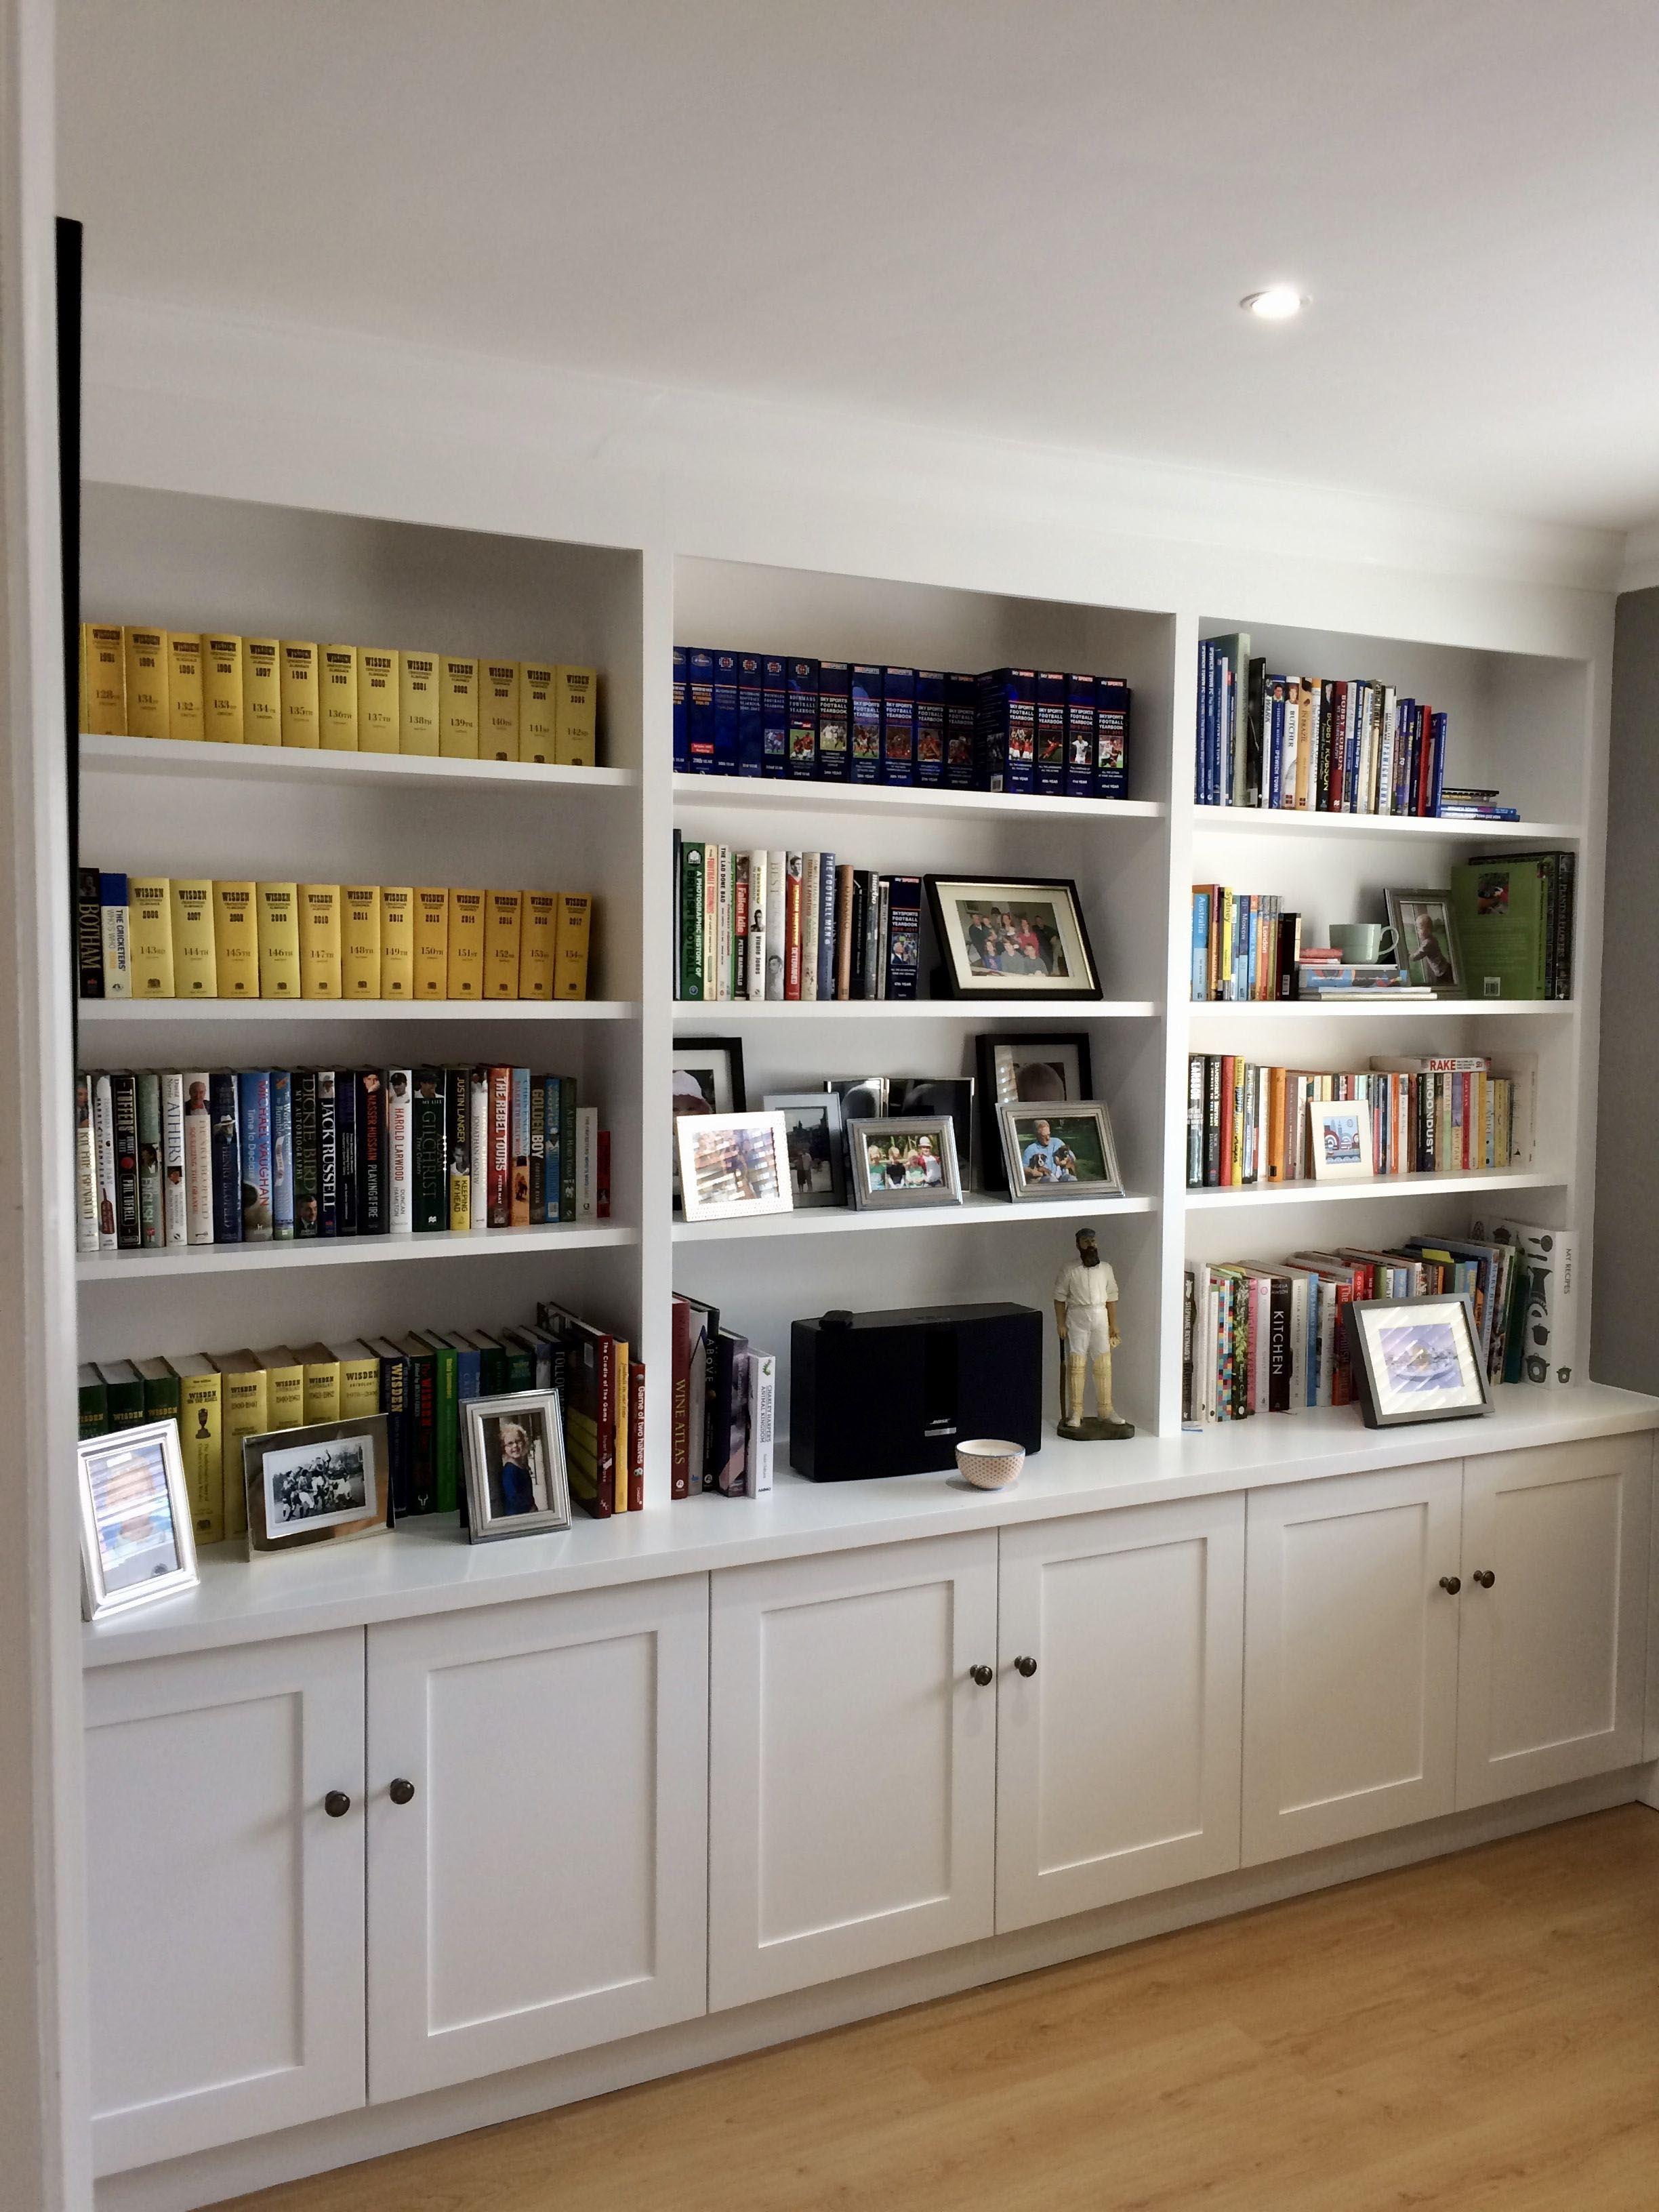 Inspiring Home Office Ideas Uk Just On Interioropedia Com With